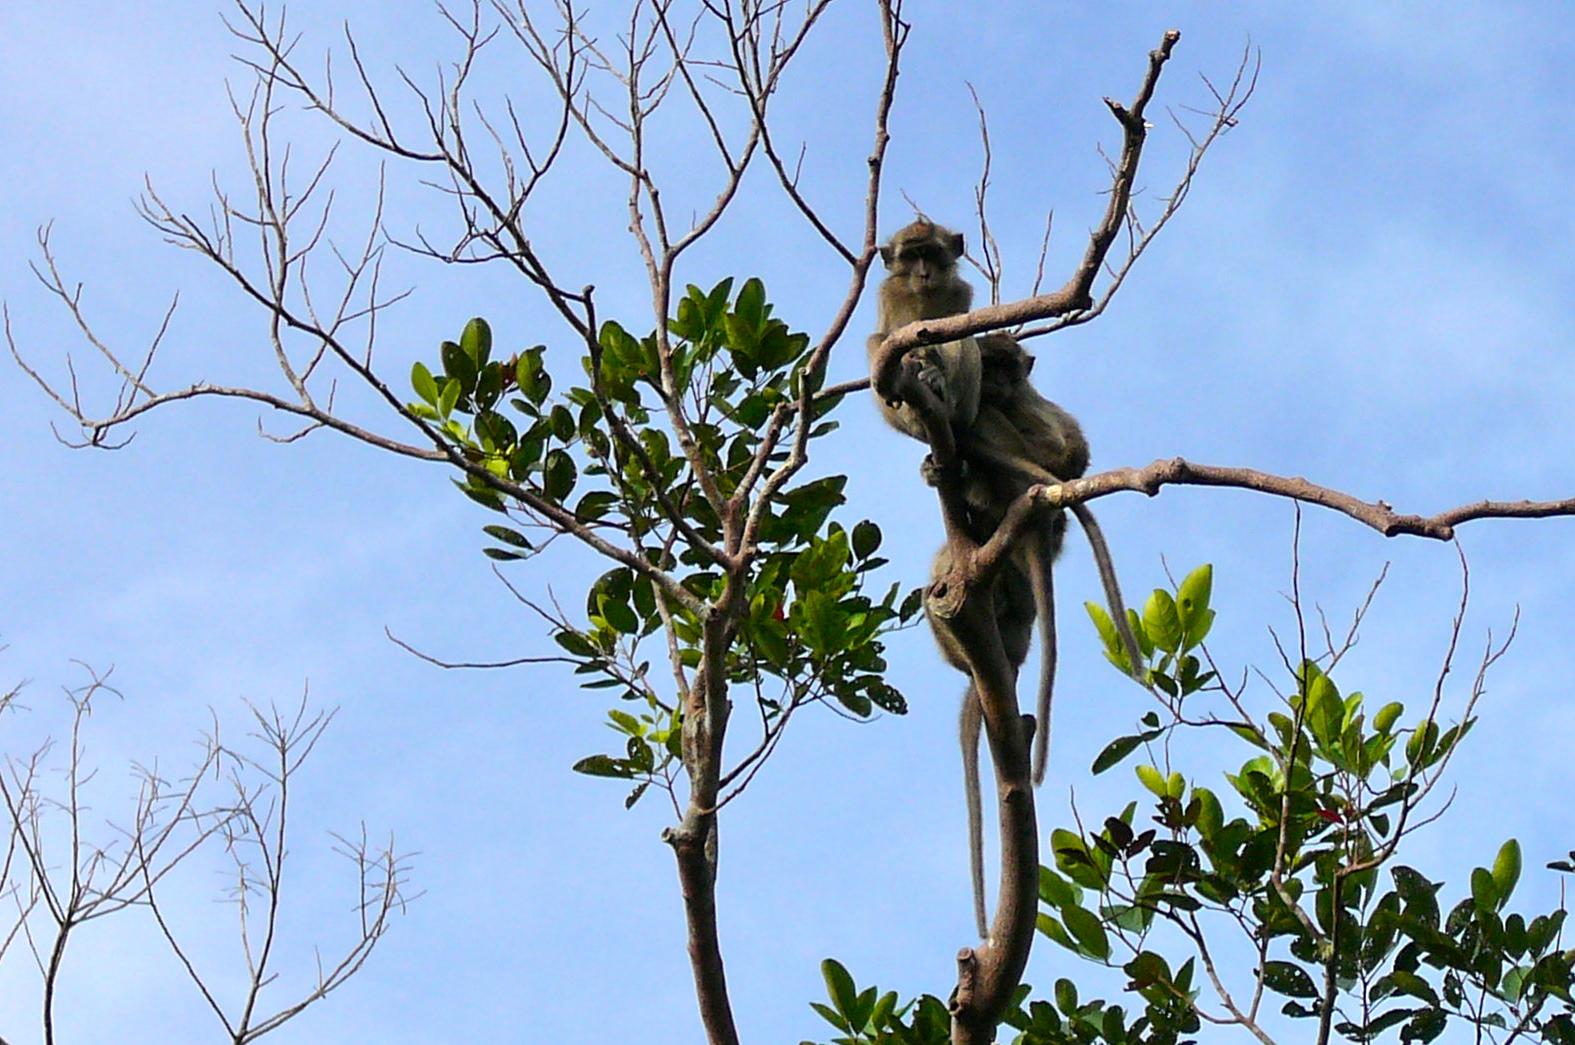 Macaque aper i Borneo. Bildet fra Rainforest Action Network.